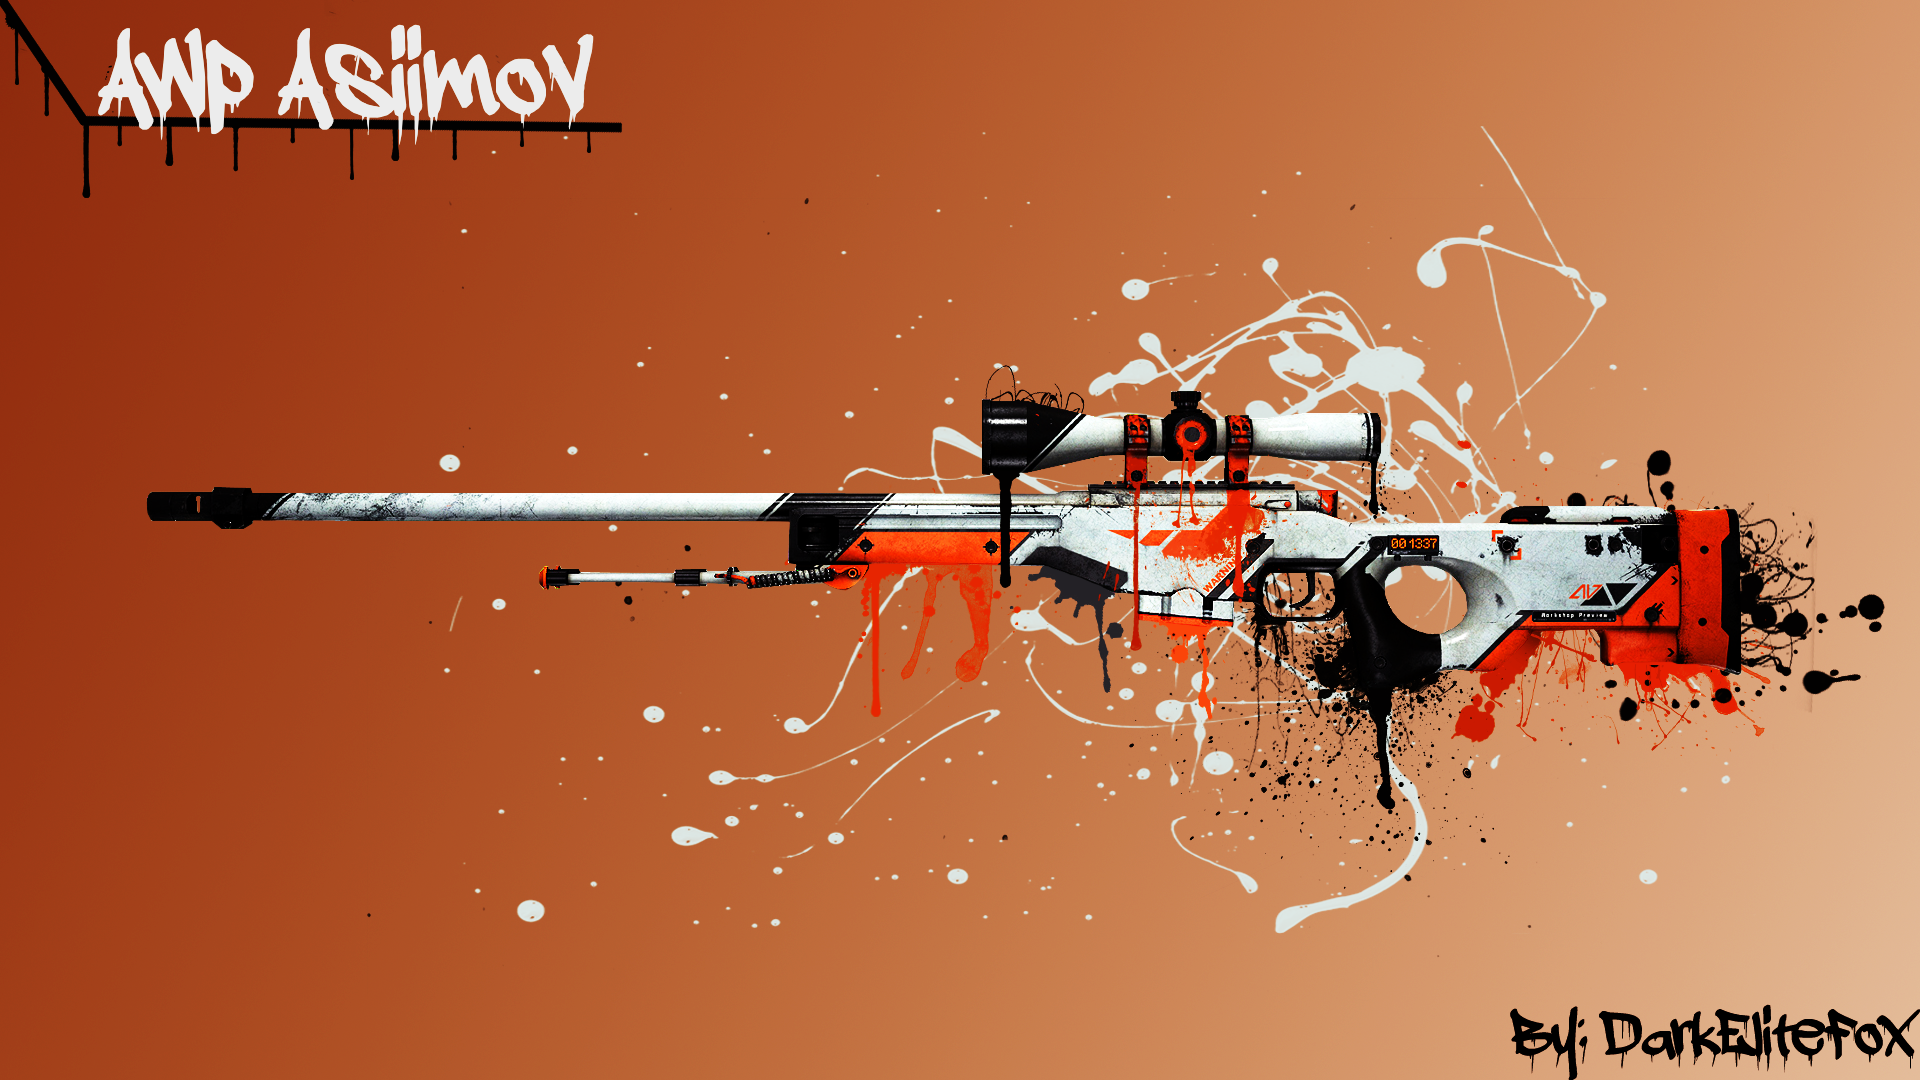 asiimov wallpaper design - photo #22